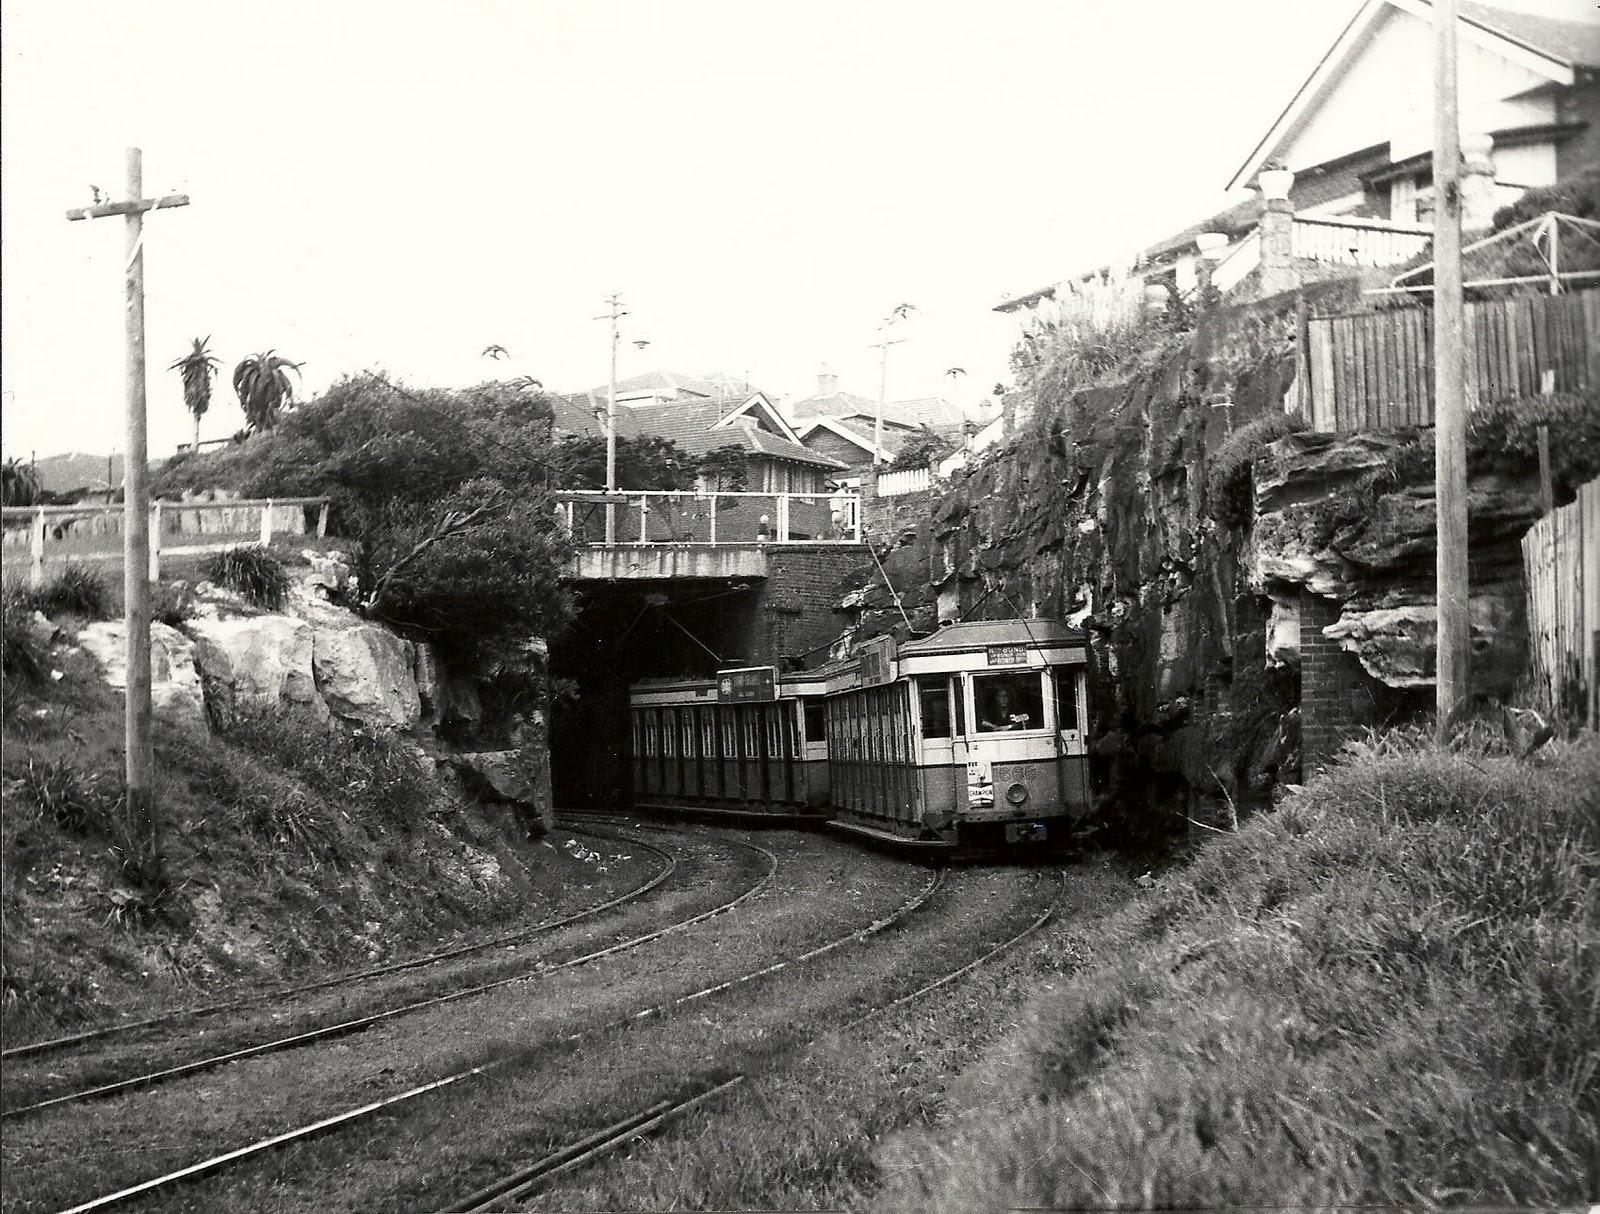 A tram to bondi beach